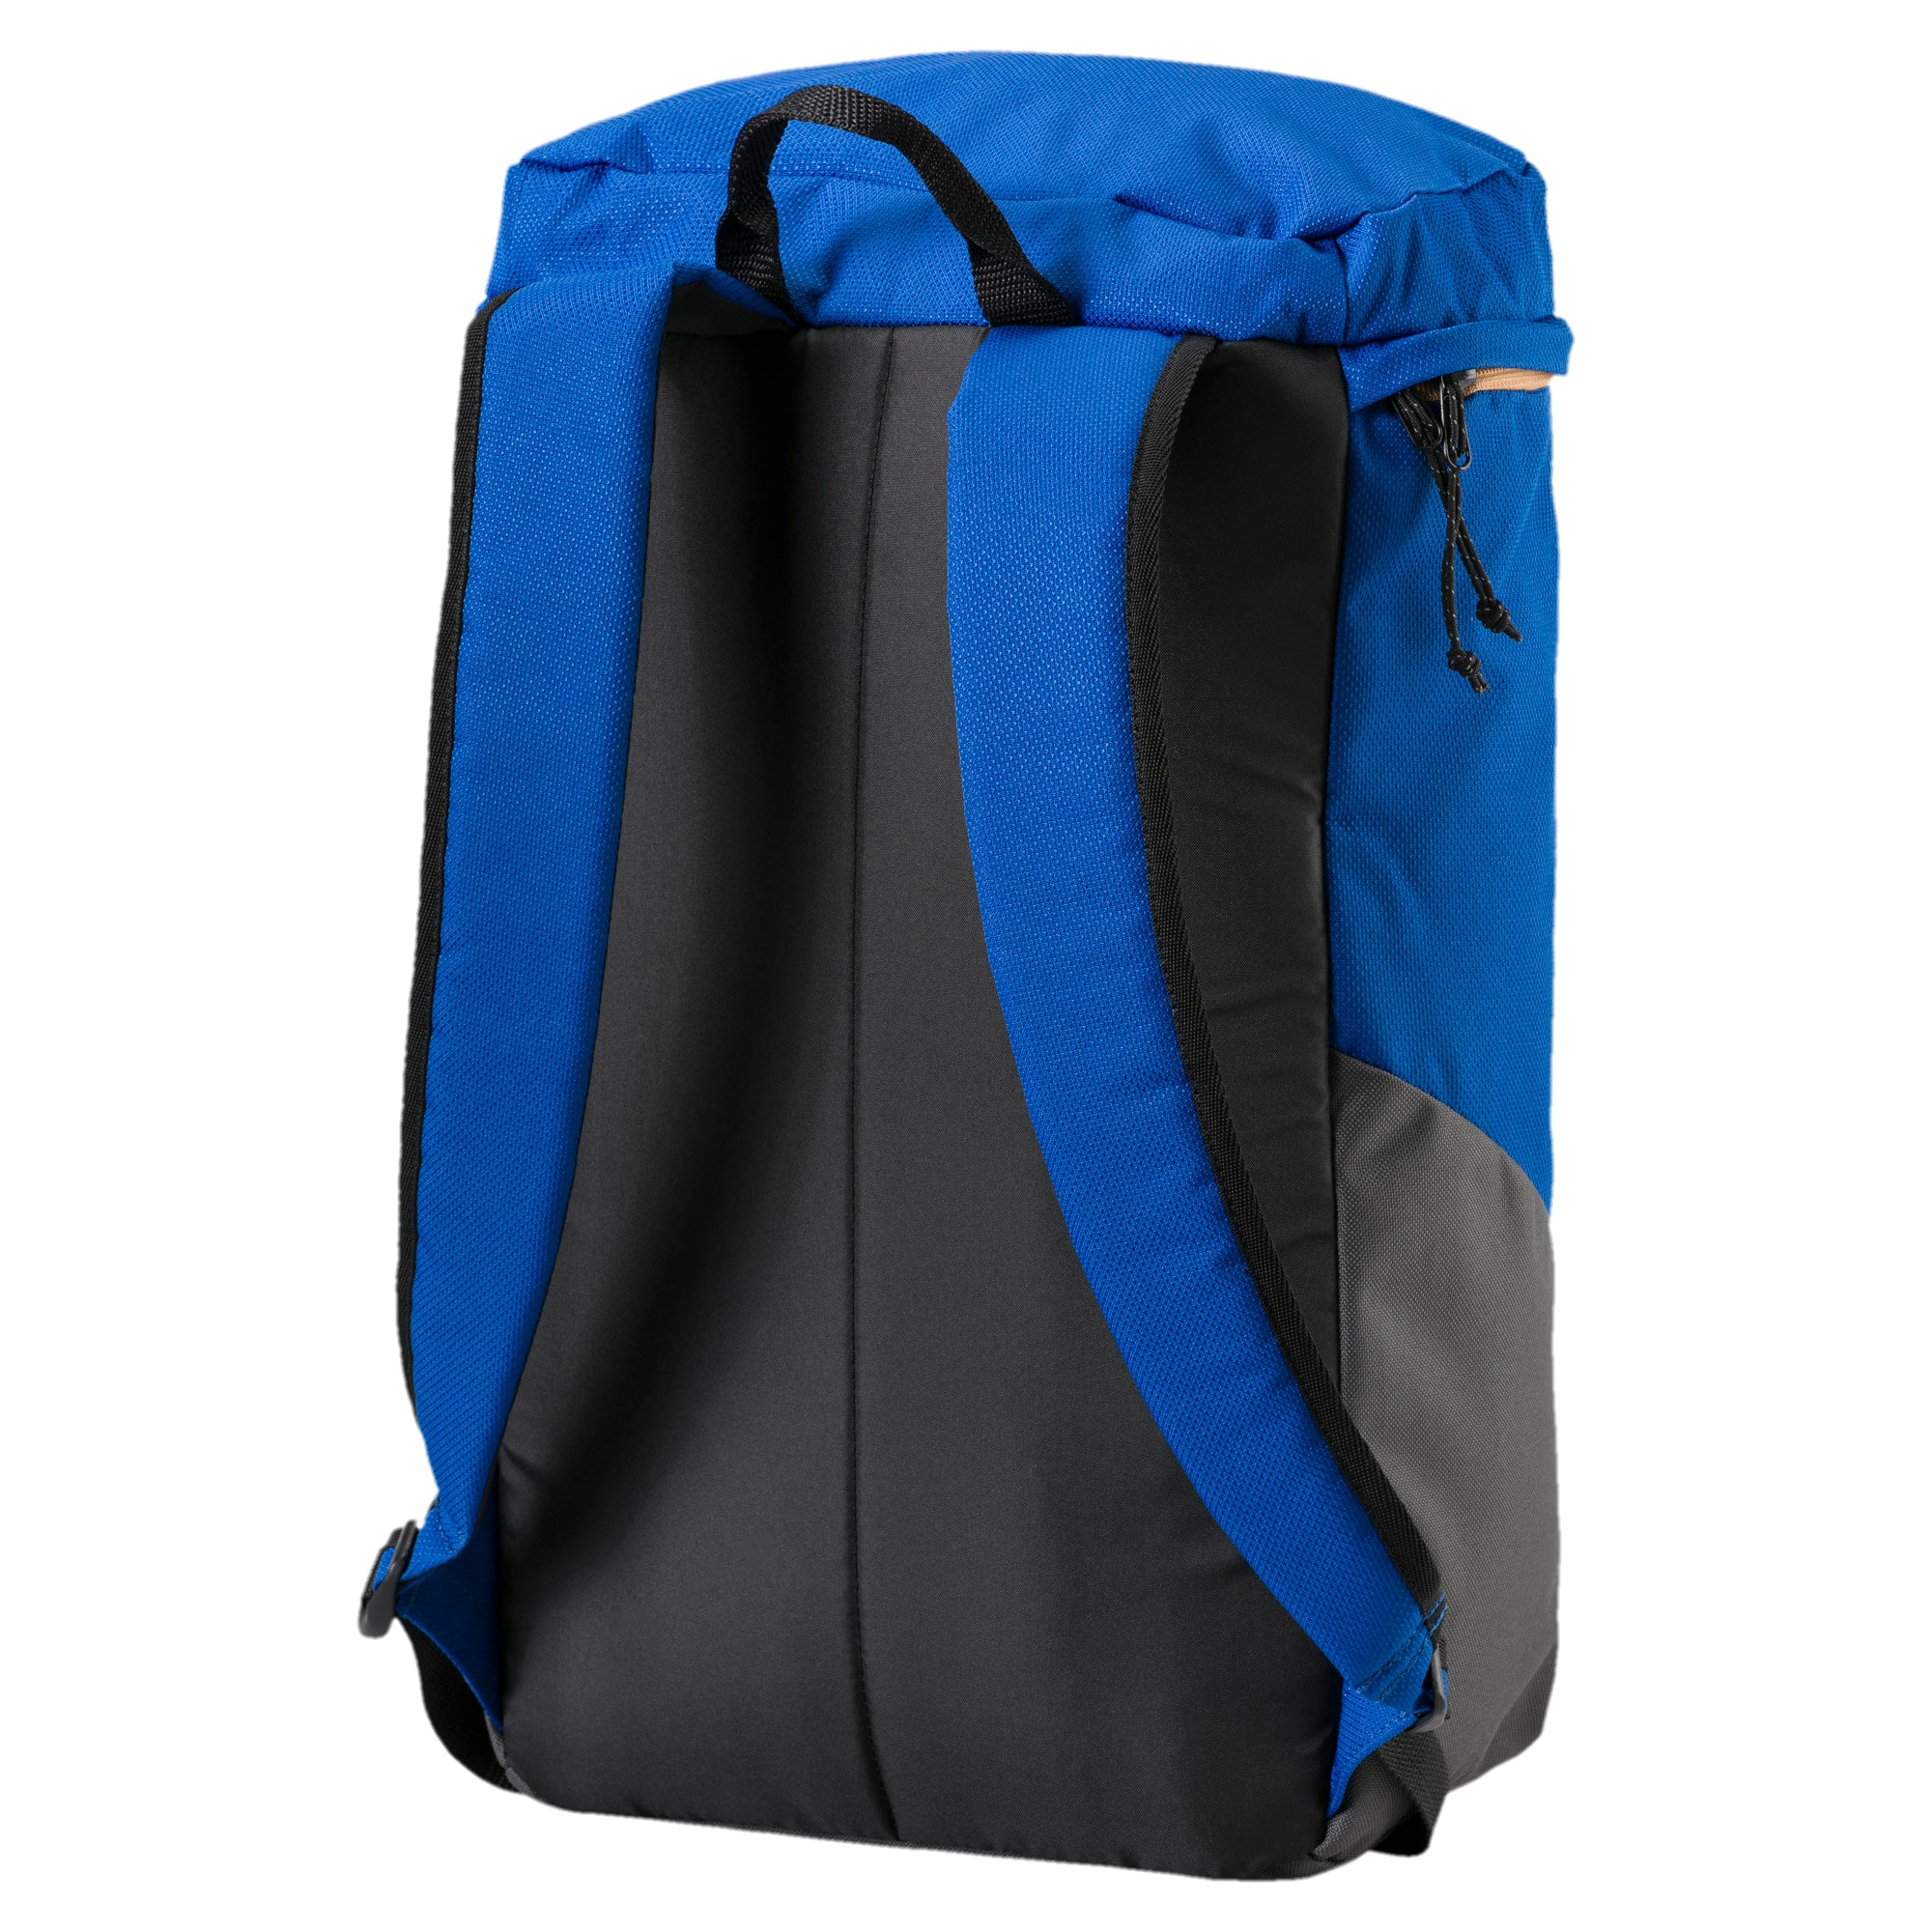 Thumbnail 2 of Sole Backpack Plus, Lapis Blue-Puma White, medium-IND